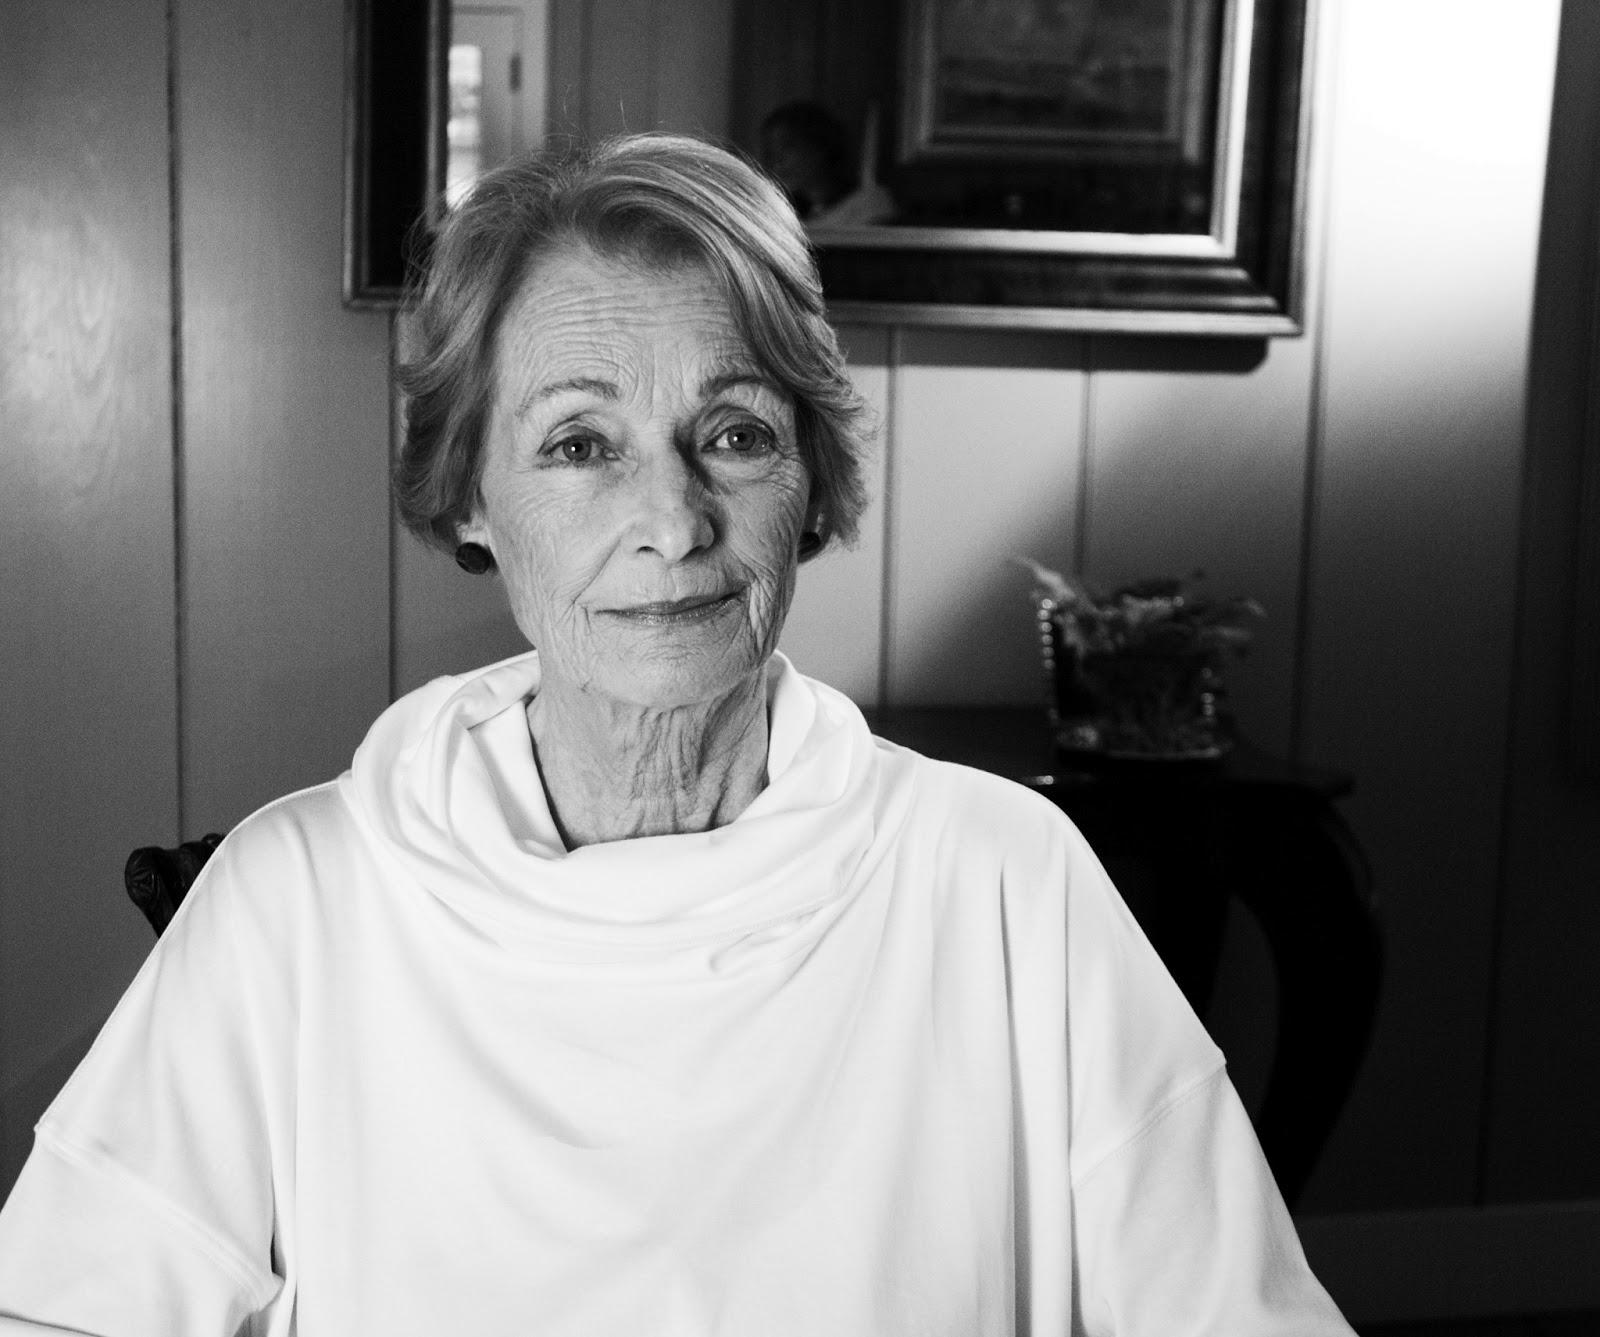 Forum on this topic: Marguerite Allan, oona-hart/